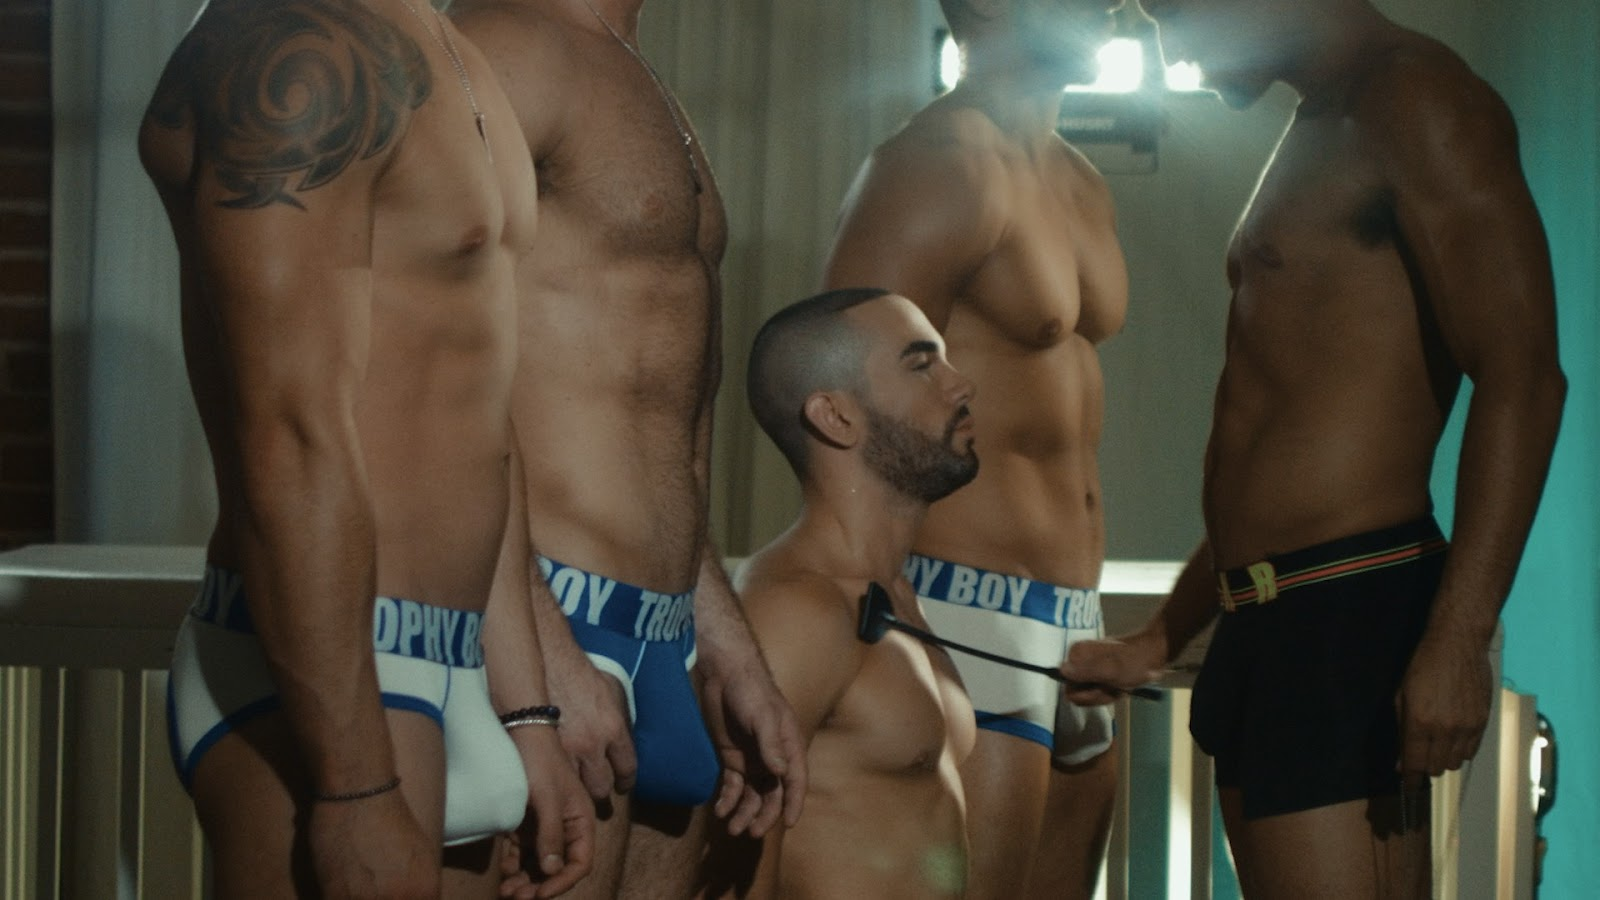 Julian serrano twerking mobile porno videos movies